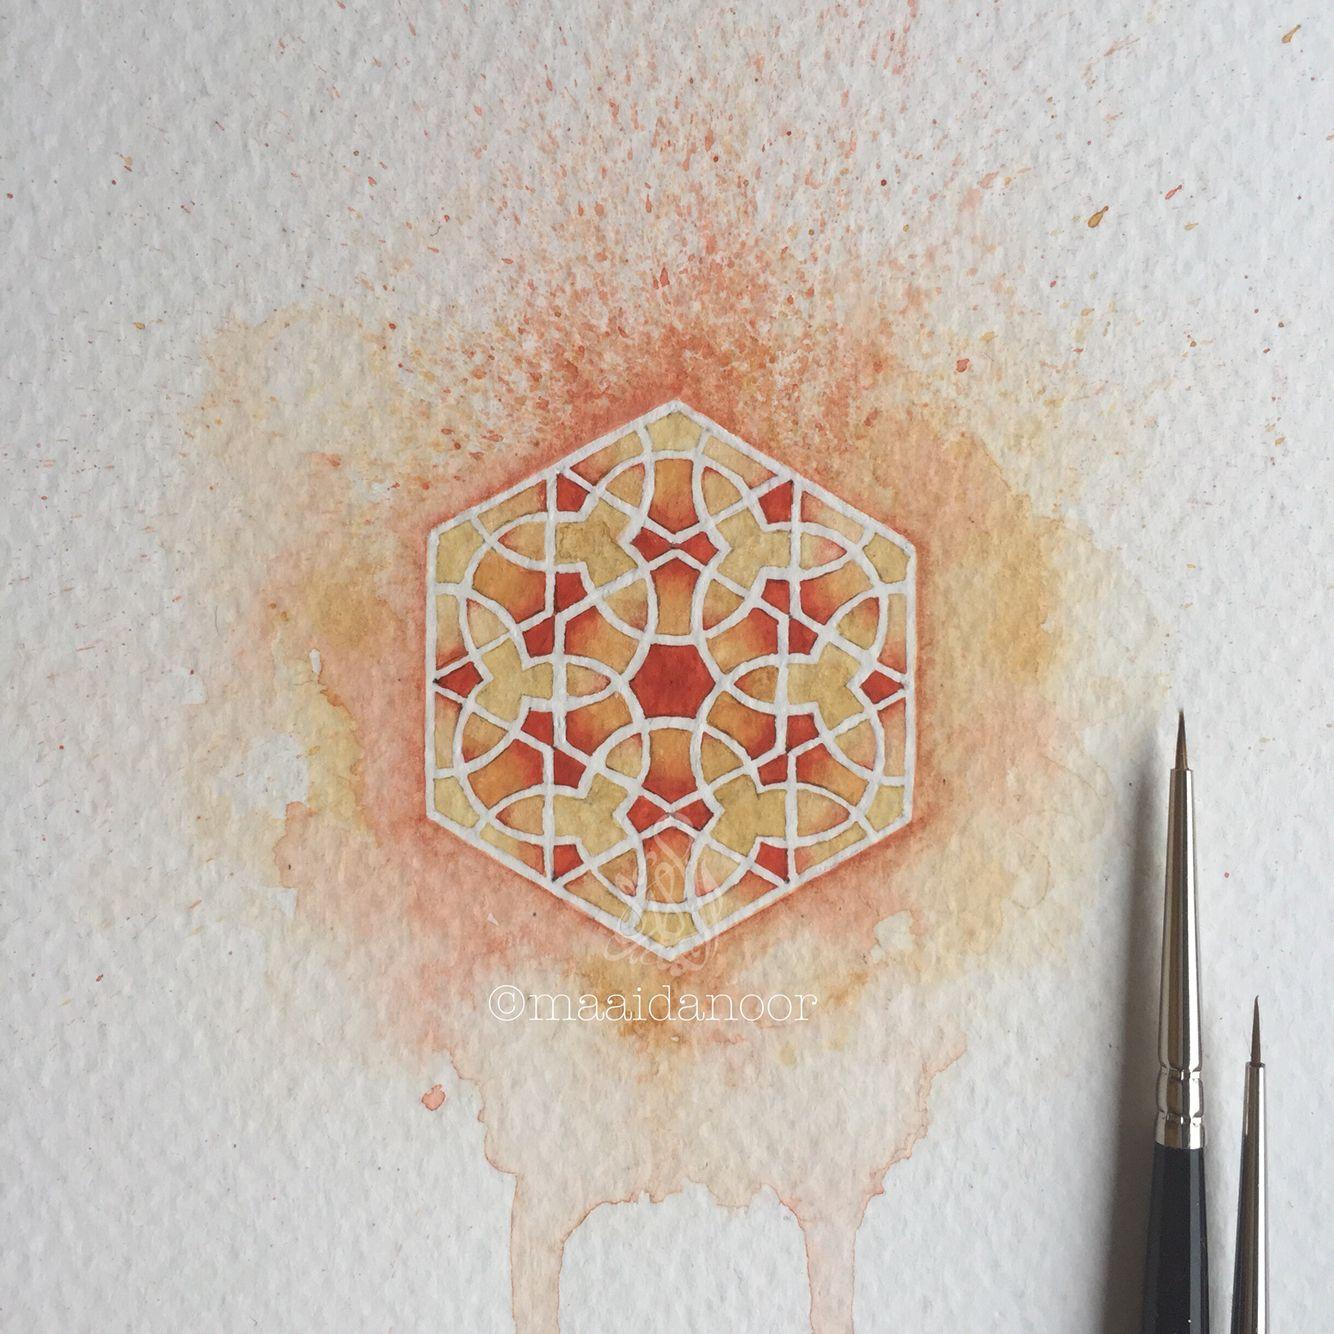 Geometry Watercolour Miniature Islamicart Maaidanoor Islami